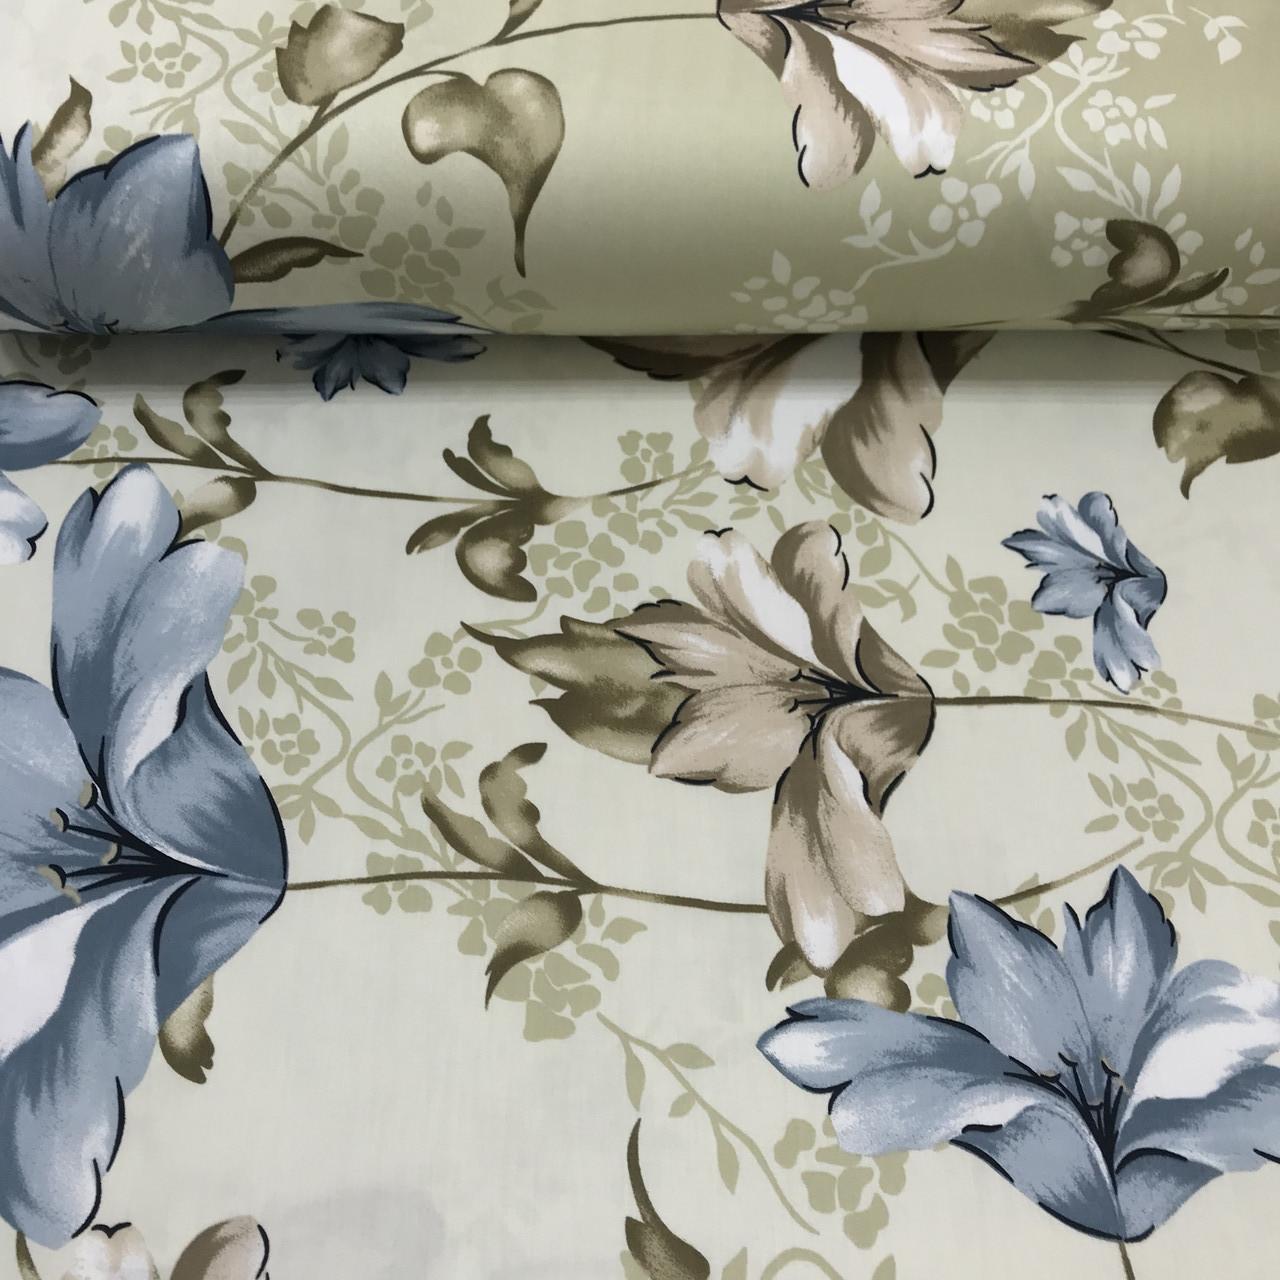 Сатин (ТУРЦИЯ шир. 2,4 м) цветы синие и бежевые на оливковом ОТРЕЗ(0,1*2,4)